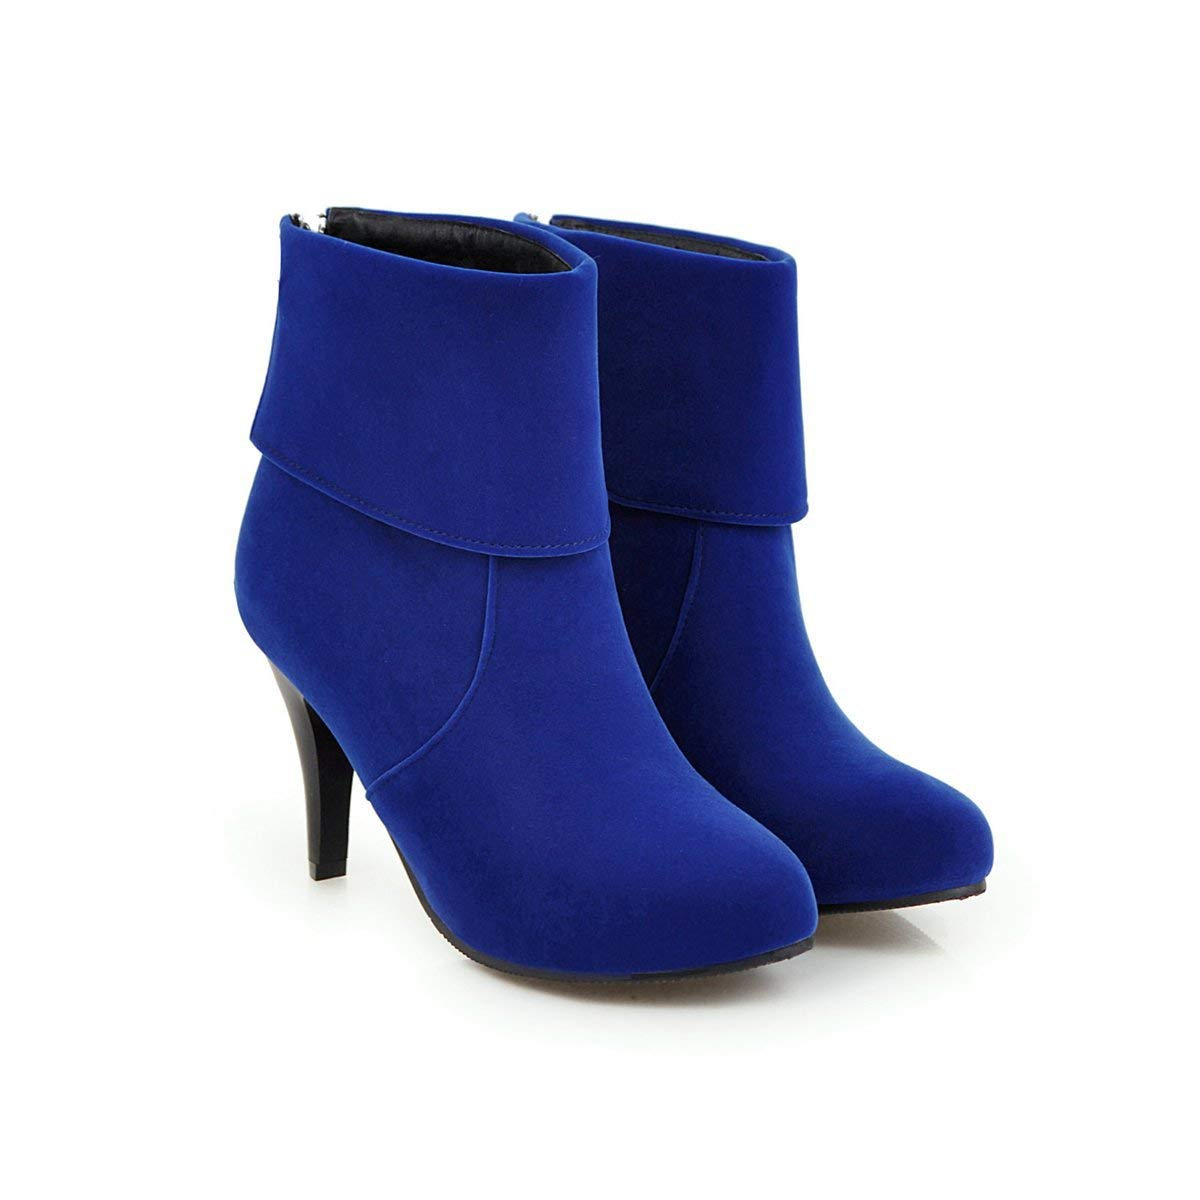 Damen Runde Toe Stiletto High Heels Kurze Stiefeletten